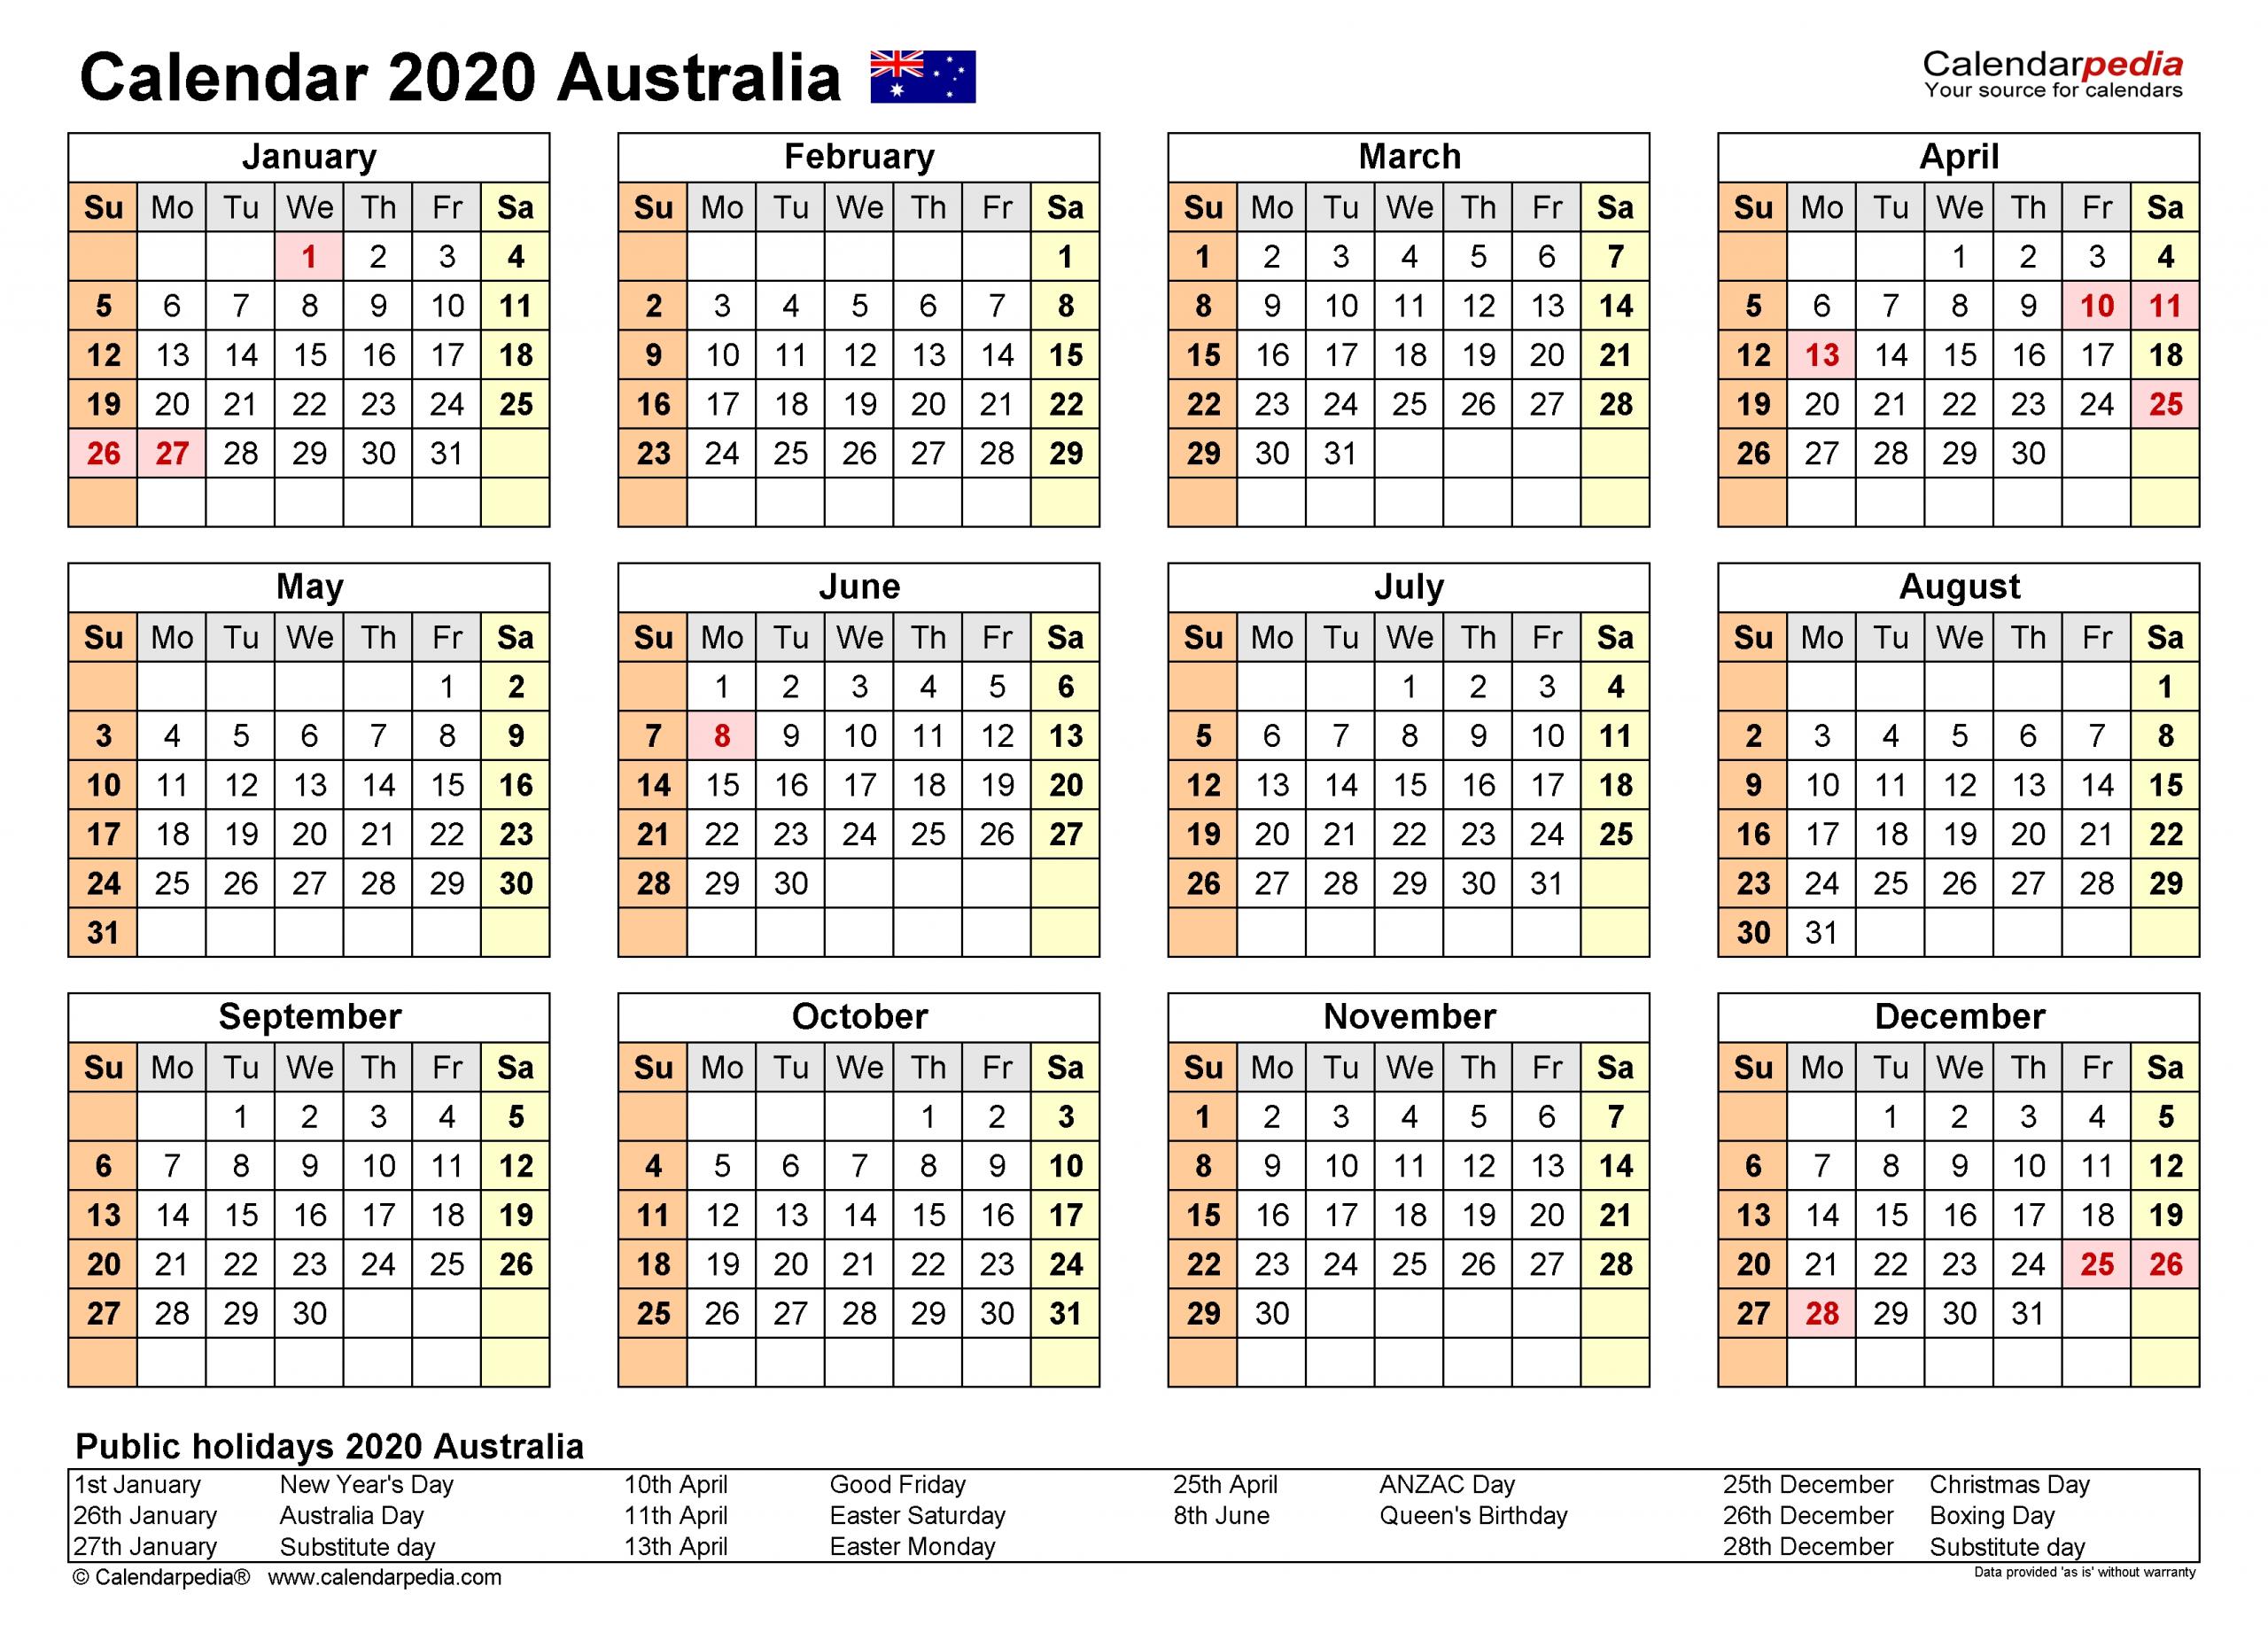 Australia Calendar 2020 - Free Printable Pdf Templates  Australian 2020 Financial Year Calendar